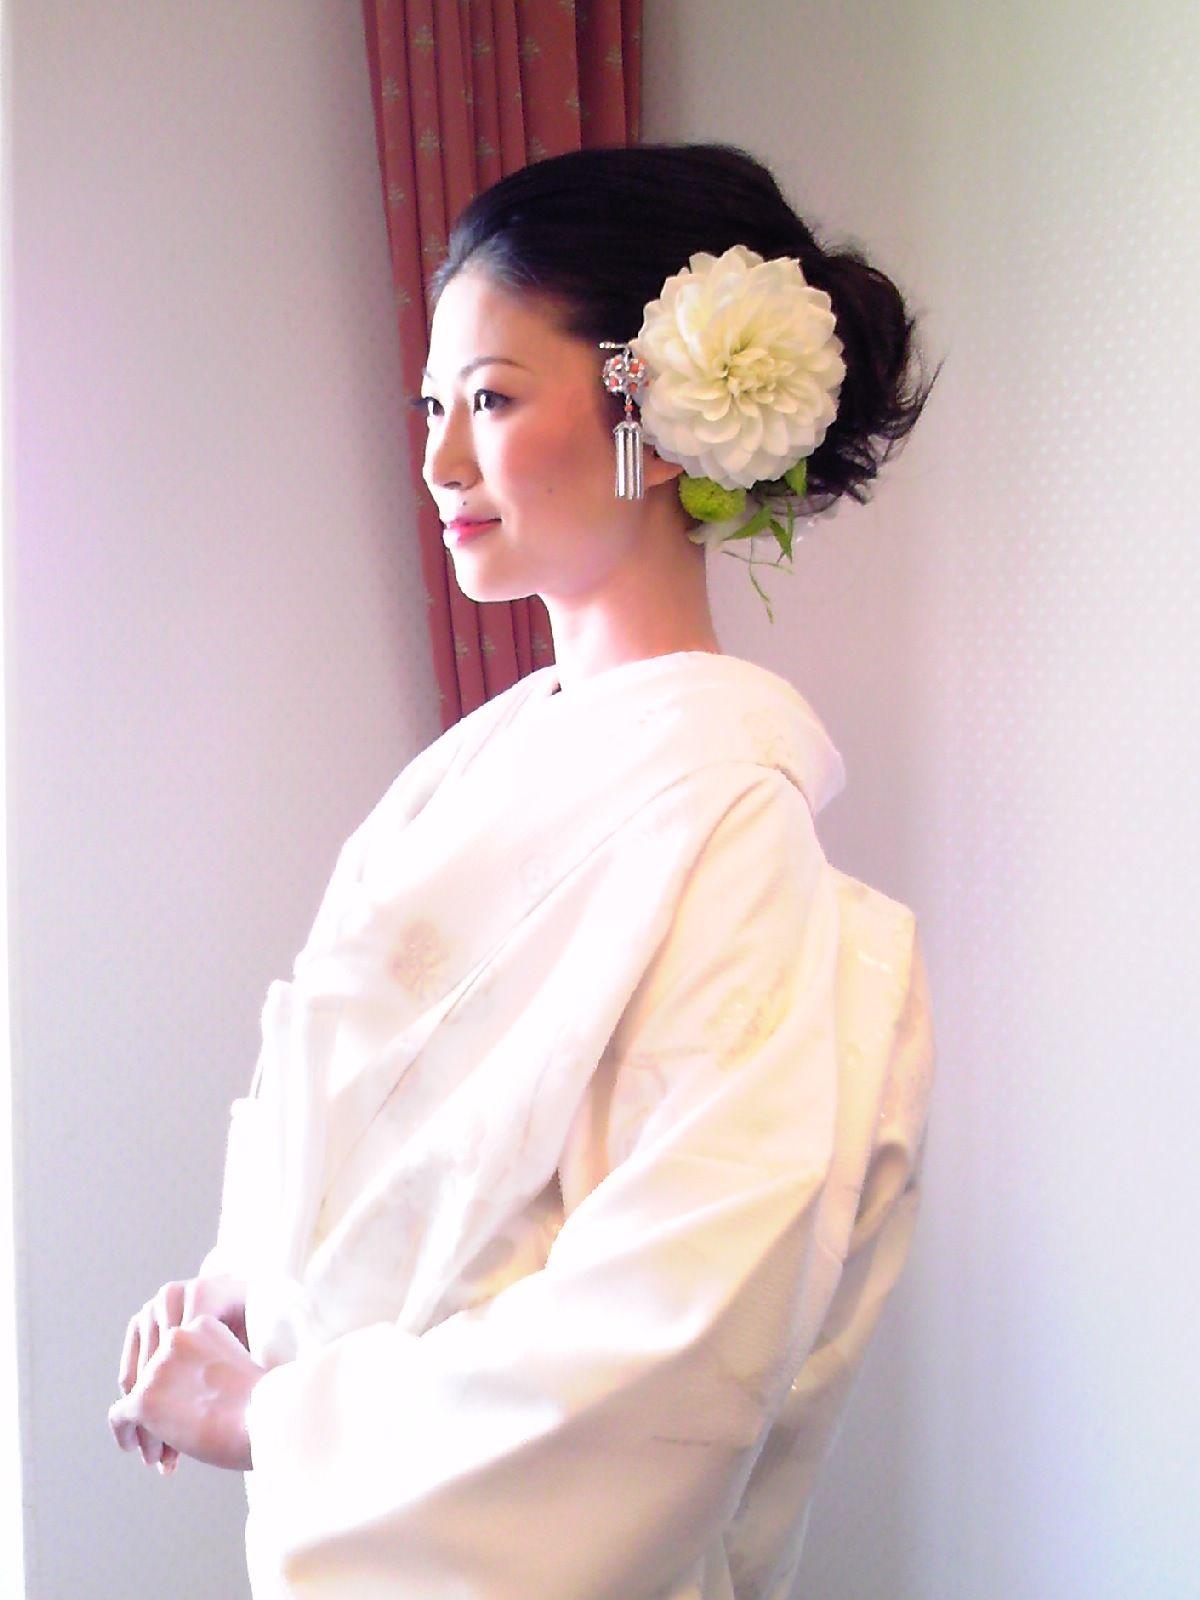 白無垢 洋髪スタイル 結婚式 白無垢 白無垢 髪型 花嫁